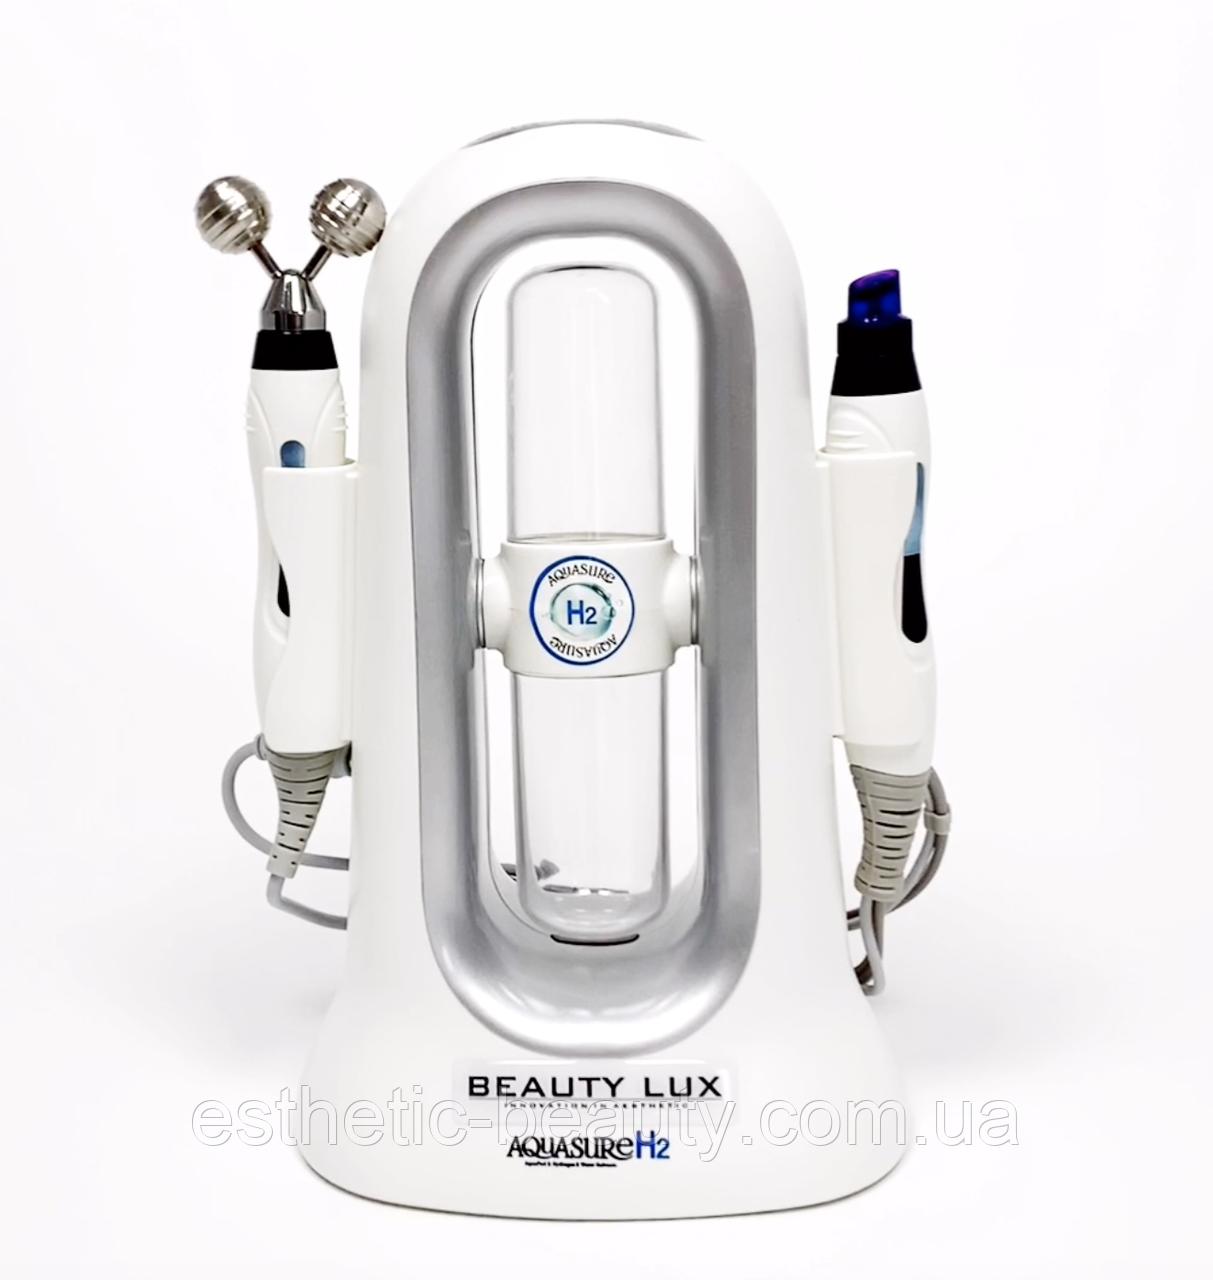 Аппарат Гидродермабразии и Микротоковой терапии Beauty Lux Aquasure